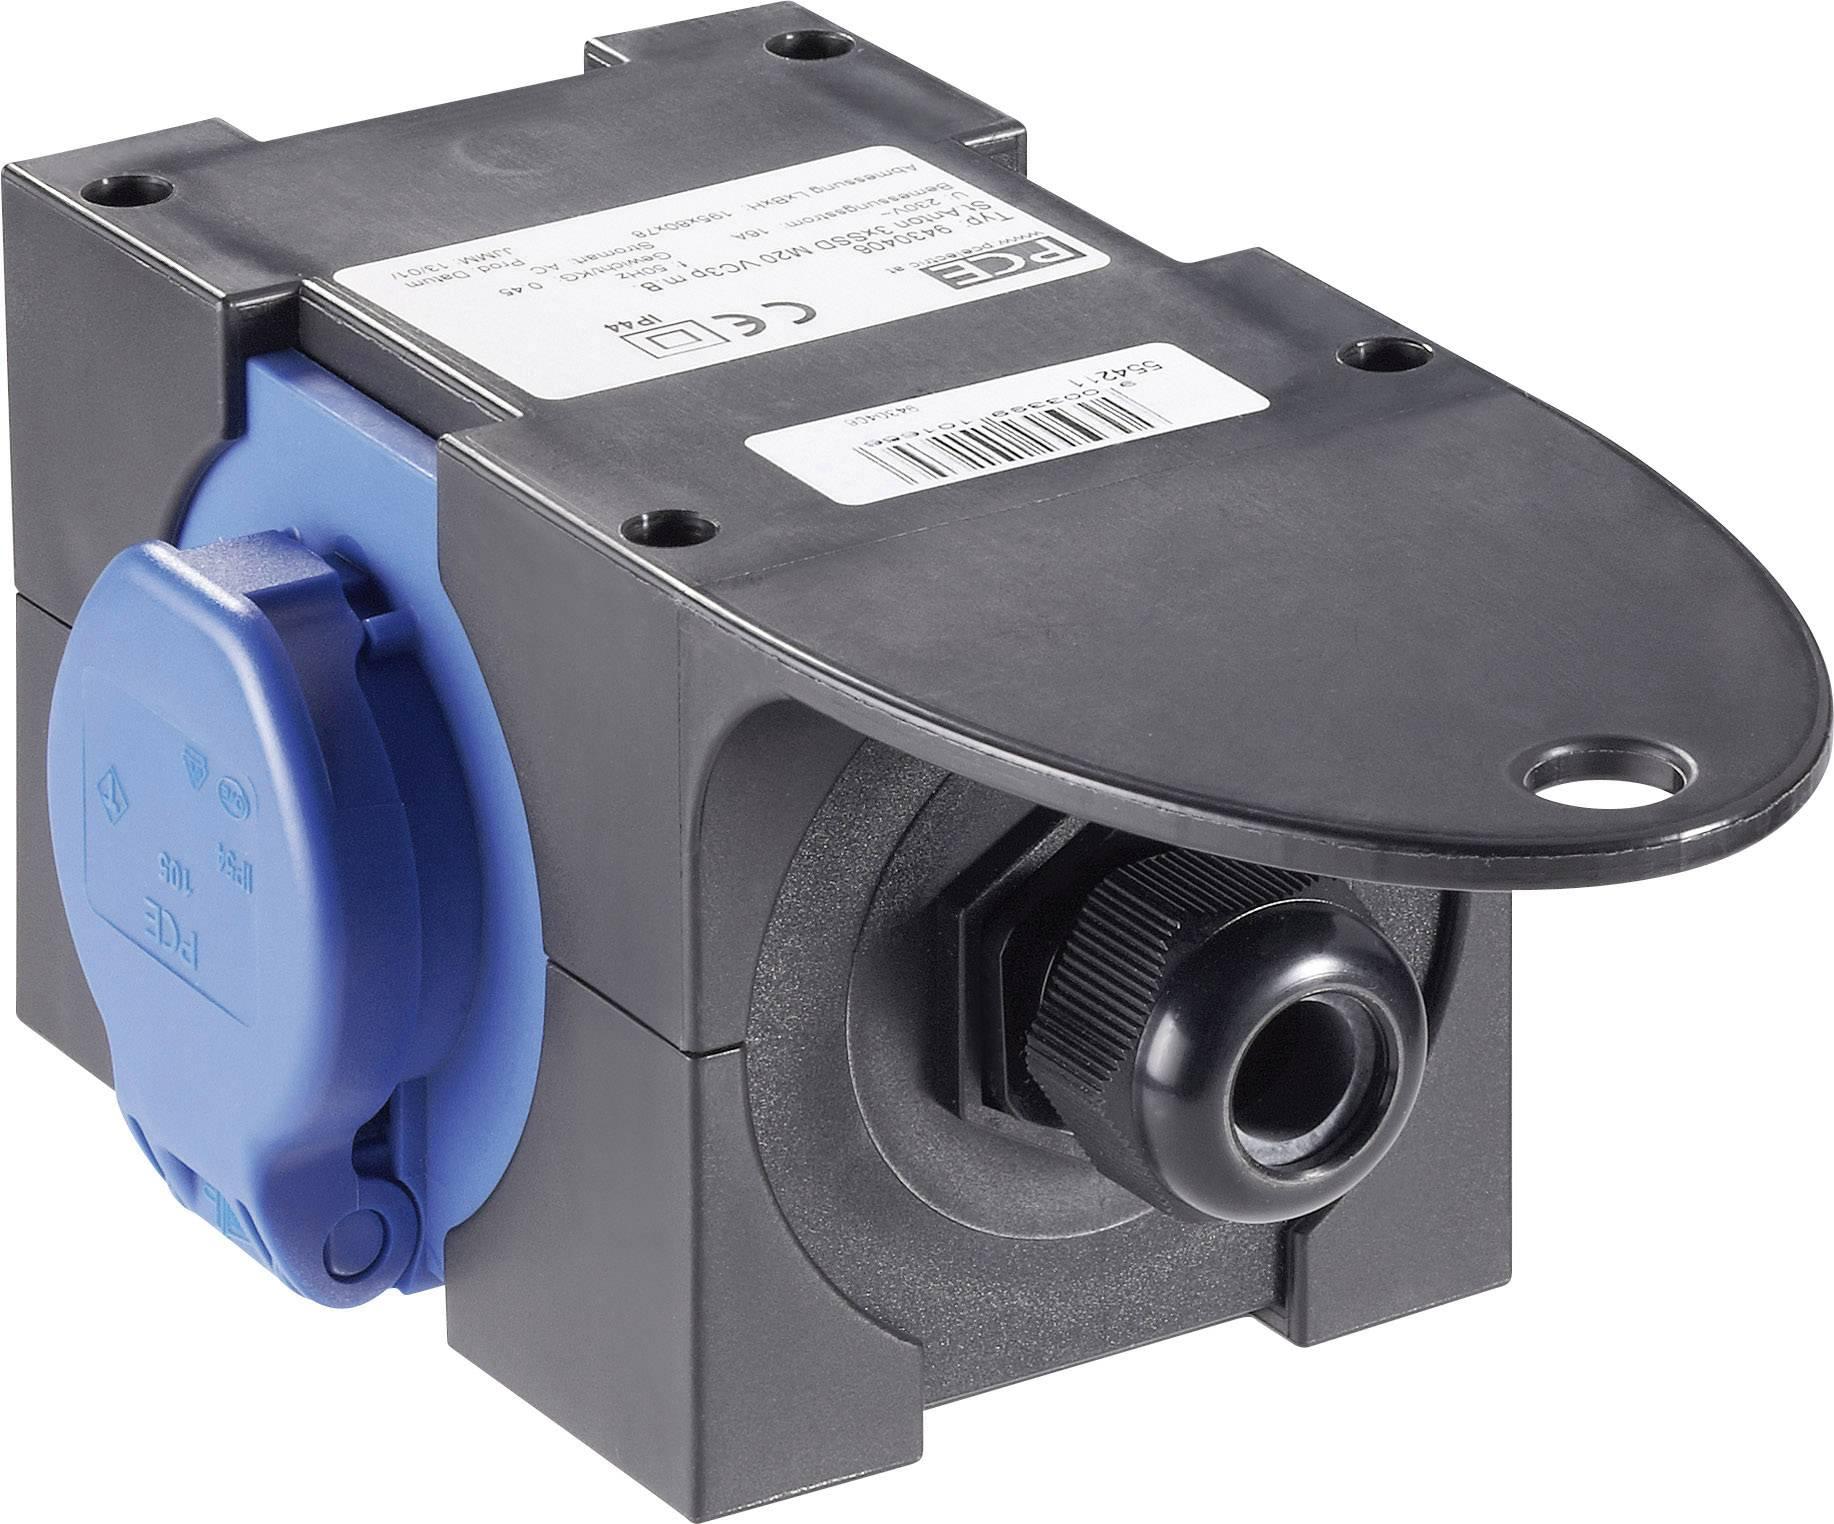 Prúdová rozbočka PCE 9430406, na kábel 10 - 14 mm (PG16), 3 zásuvky, IP44